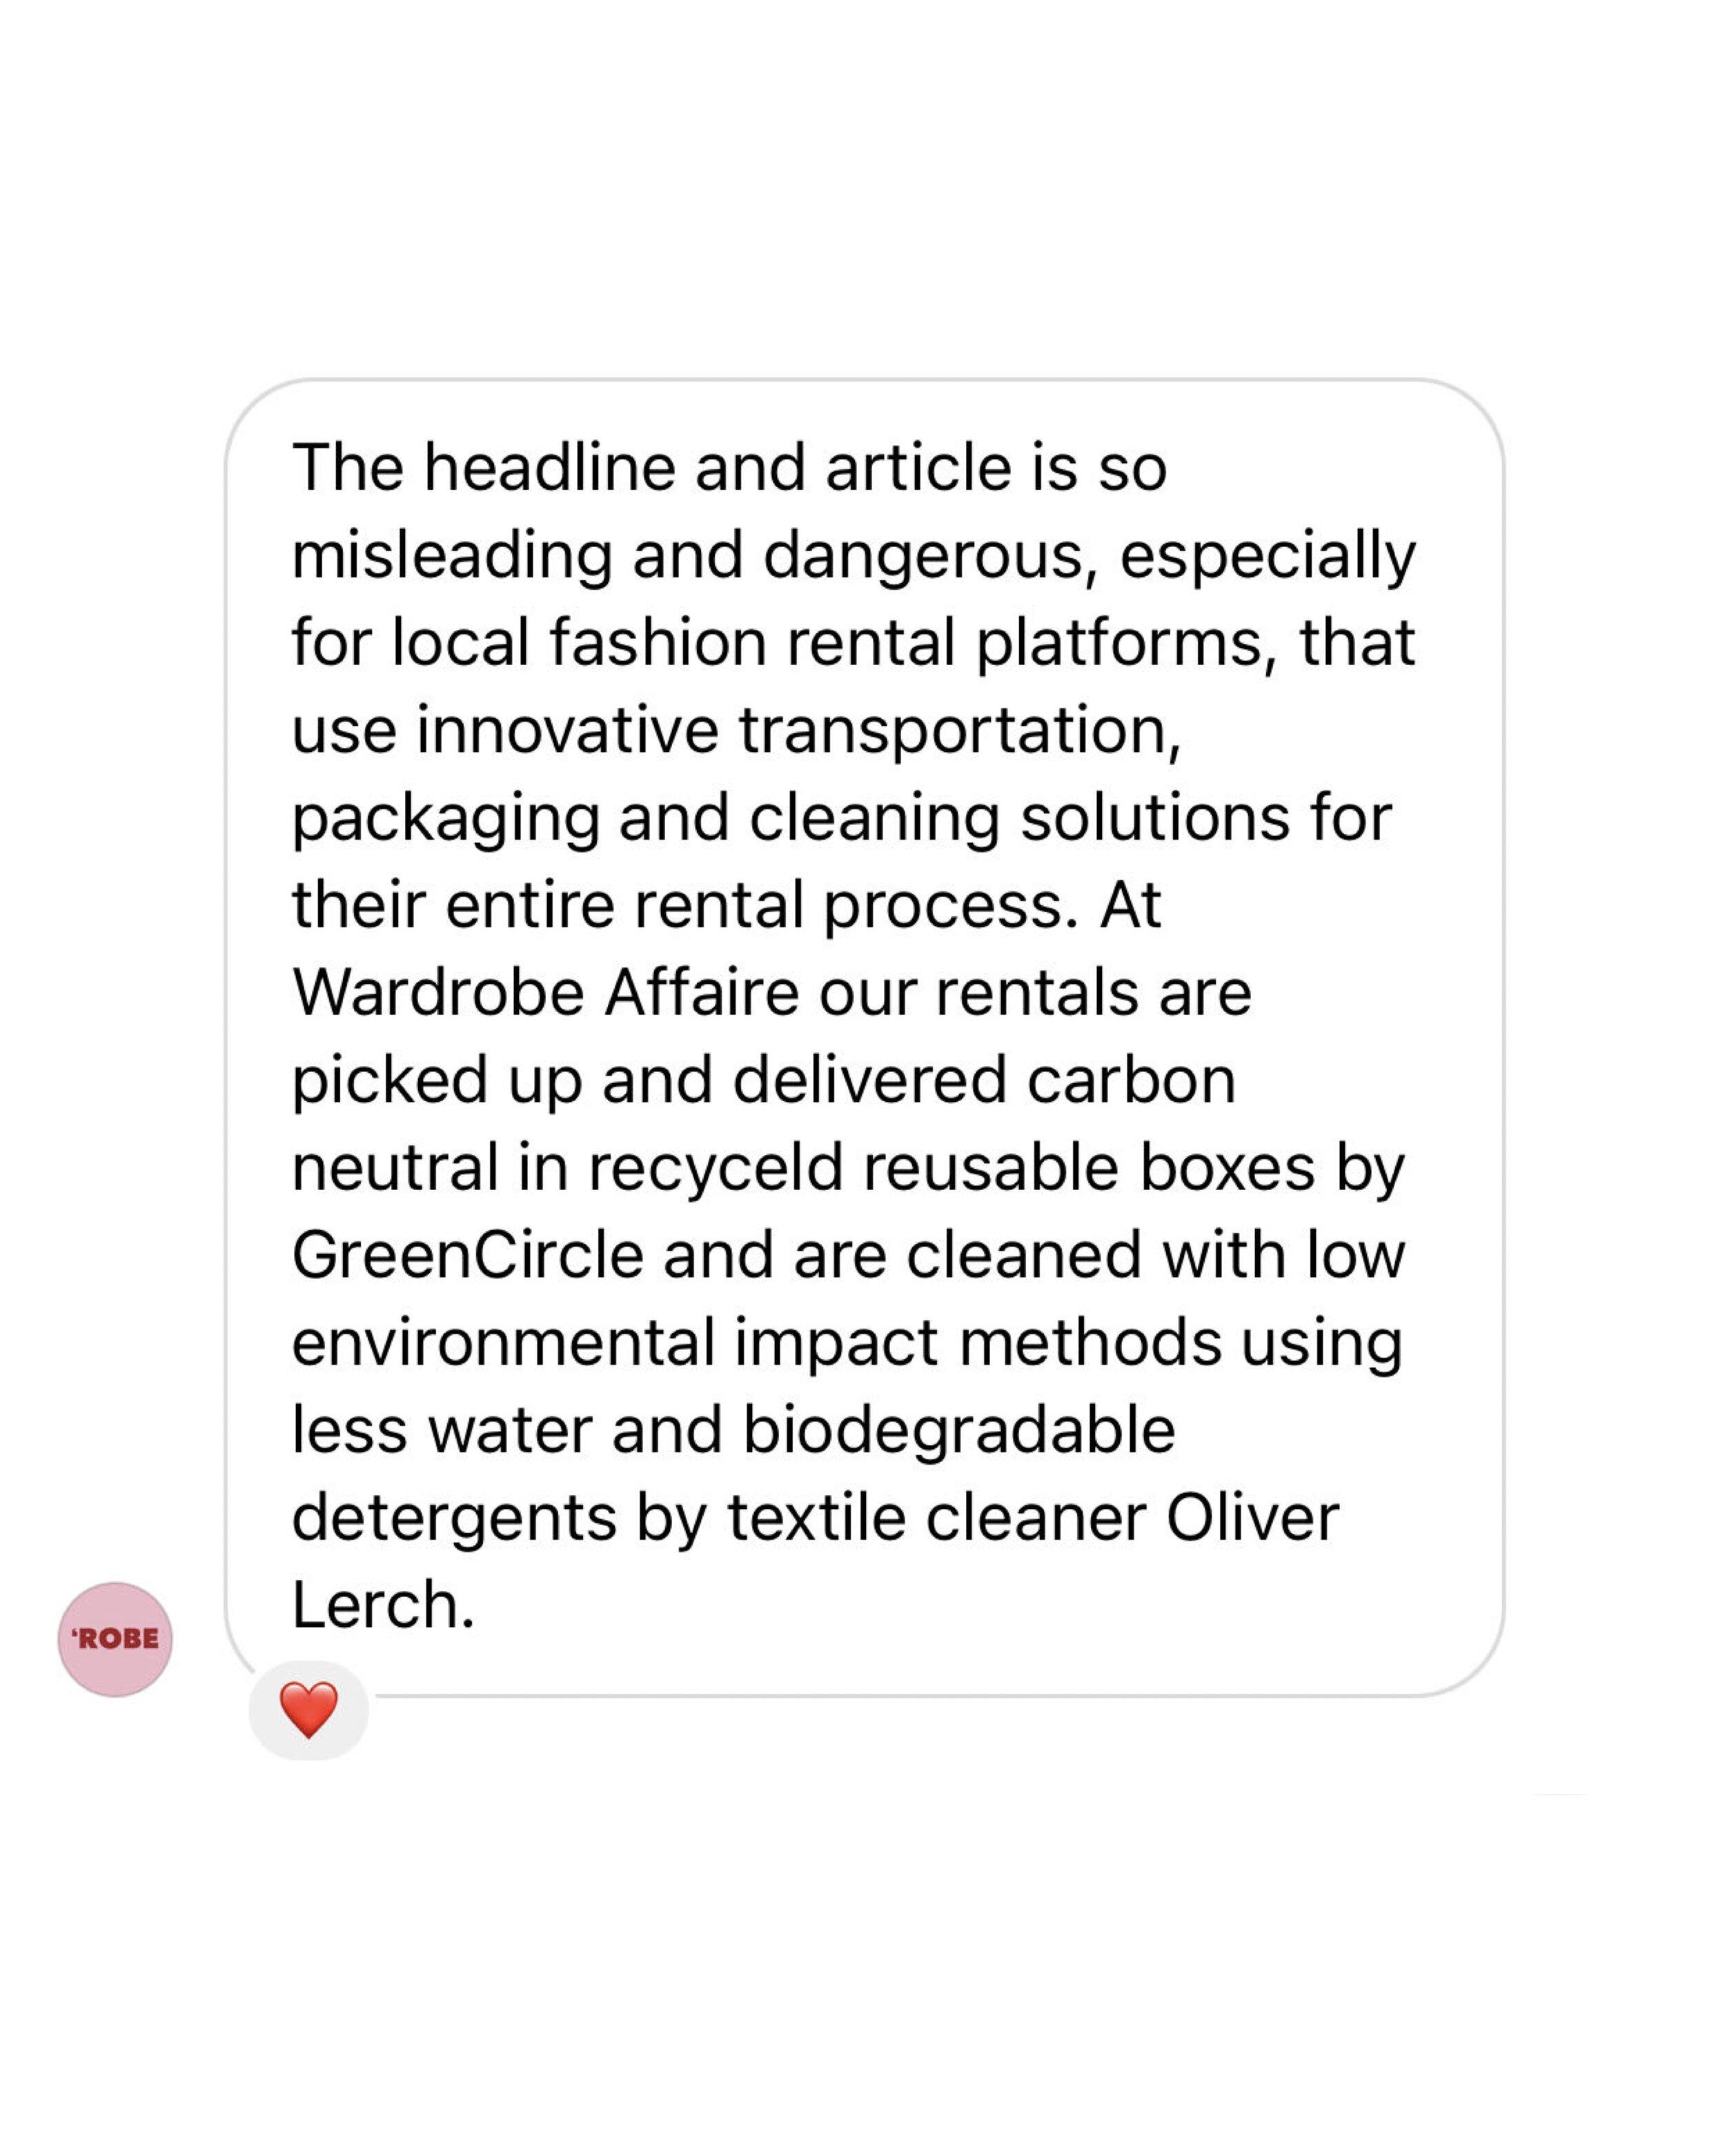 clothing-rental-sustainable-wardrobeaffair.JPG